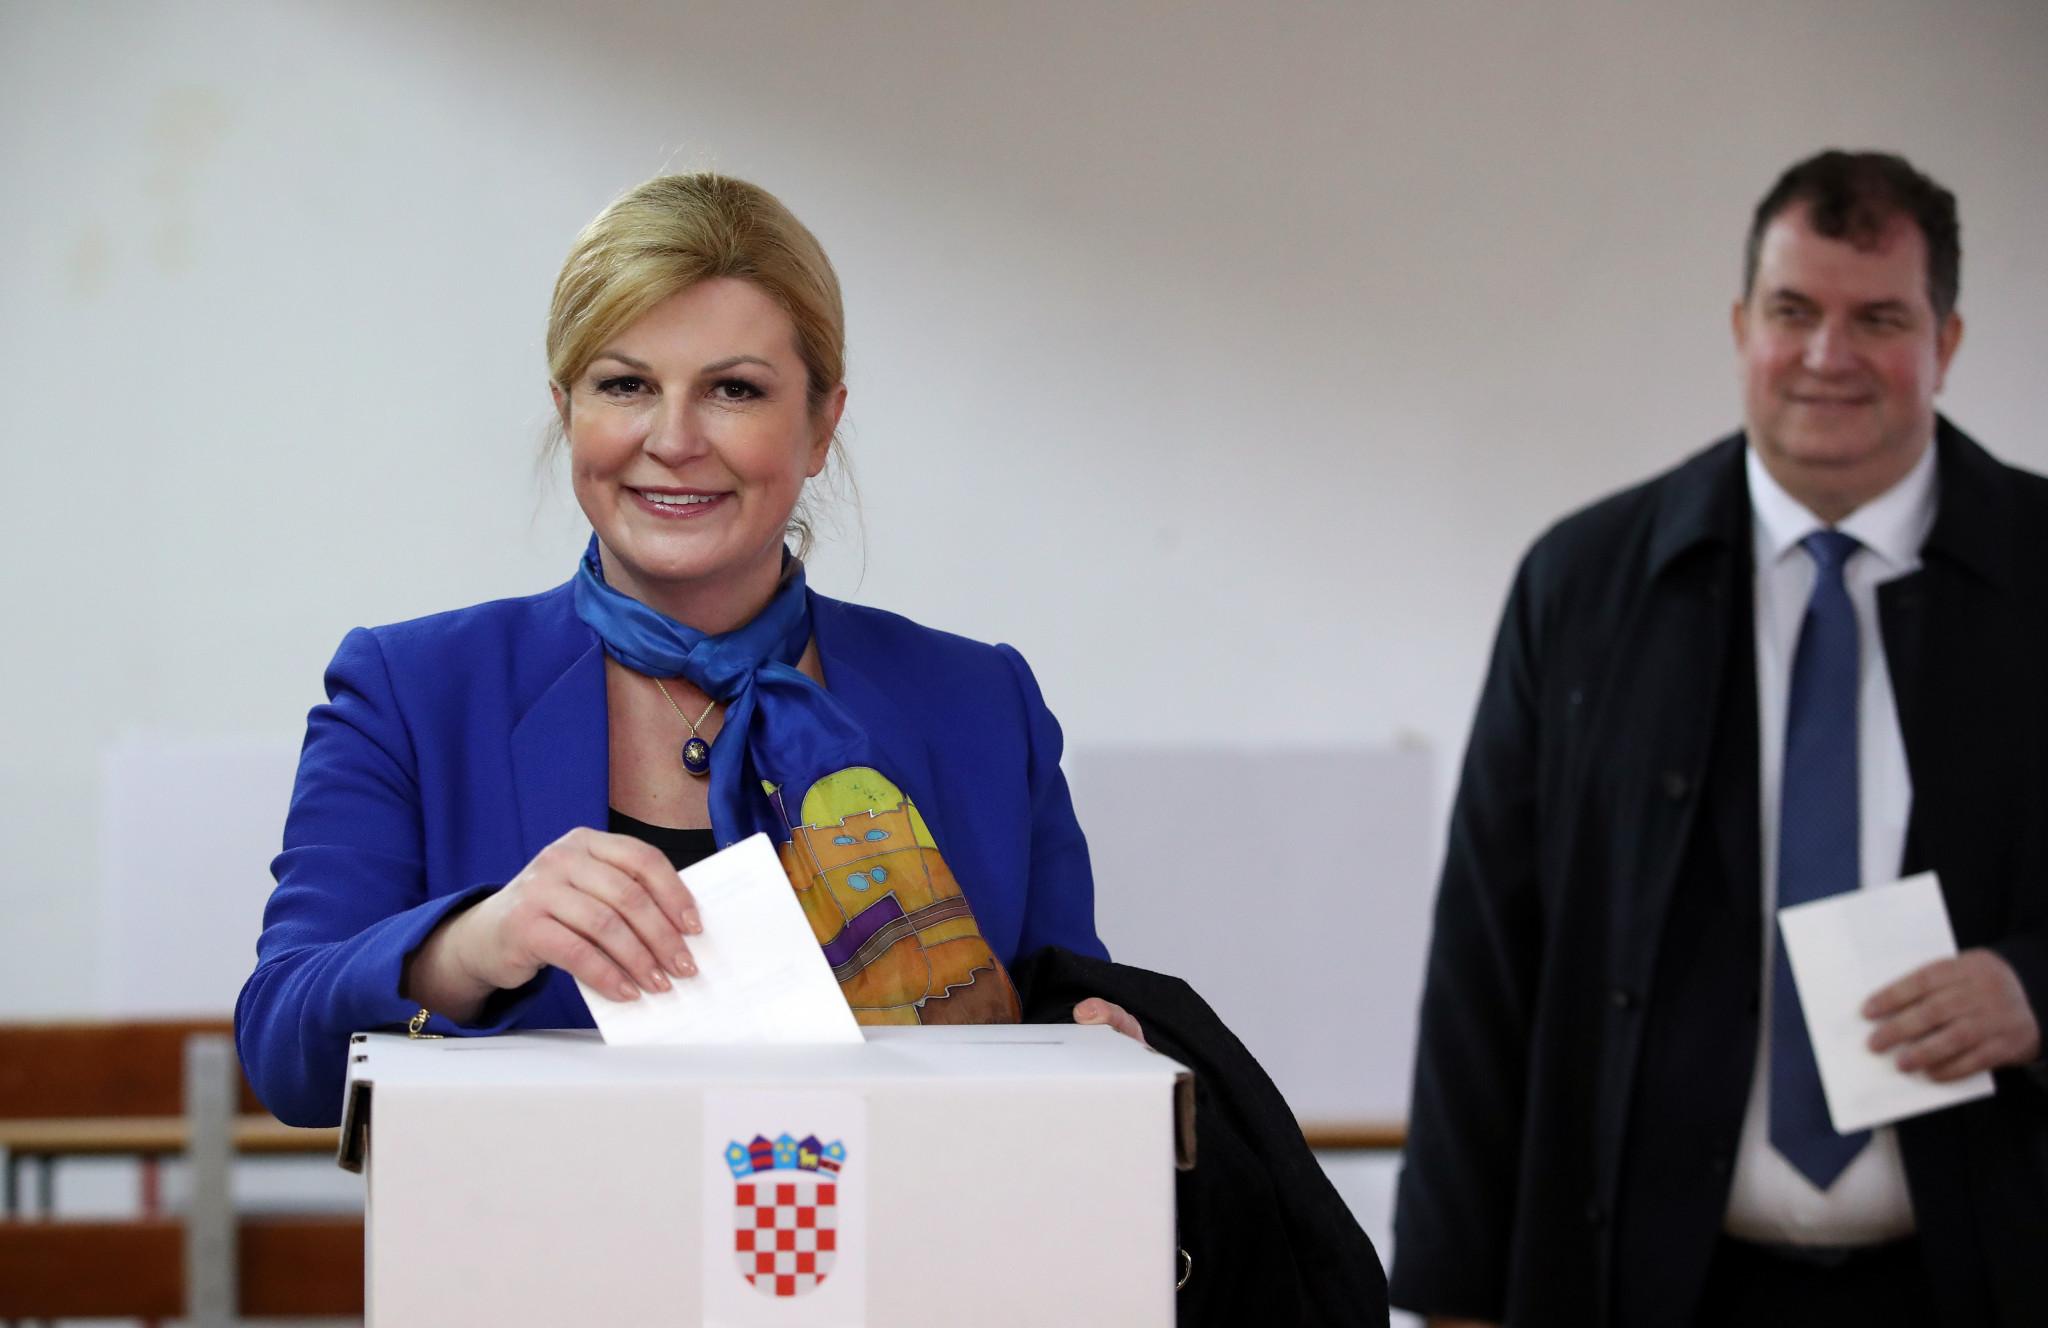 Former Croatian President Kolinda Grabar-Kitarović is the new President of the IOC Future Host Commission ©Getty Images